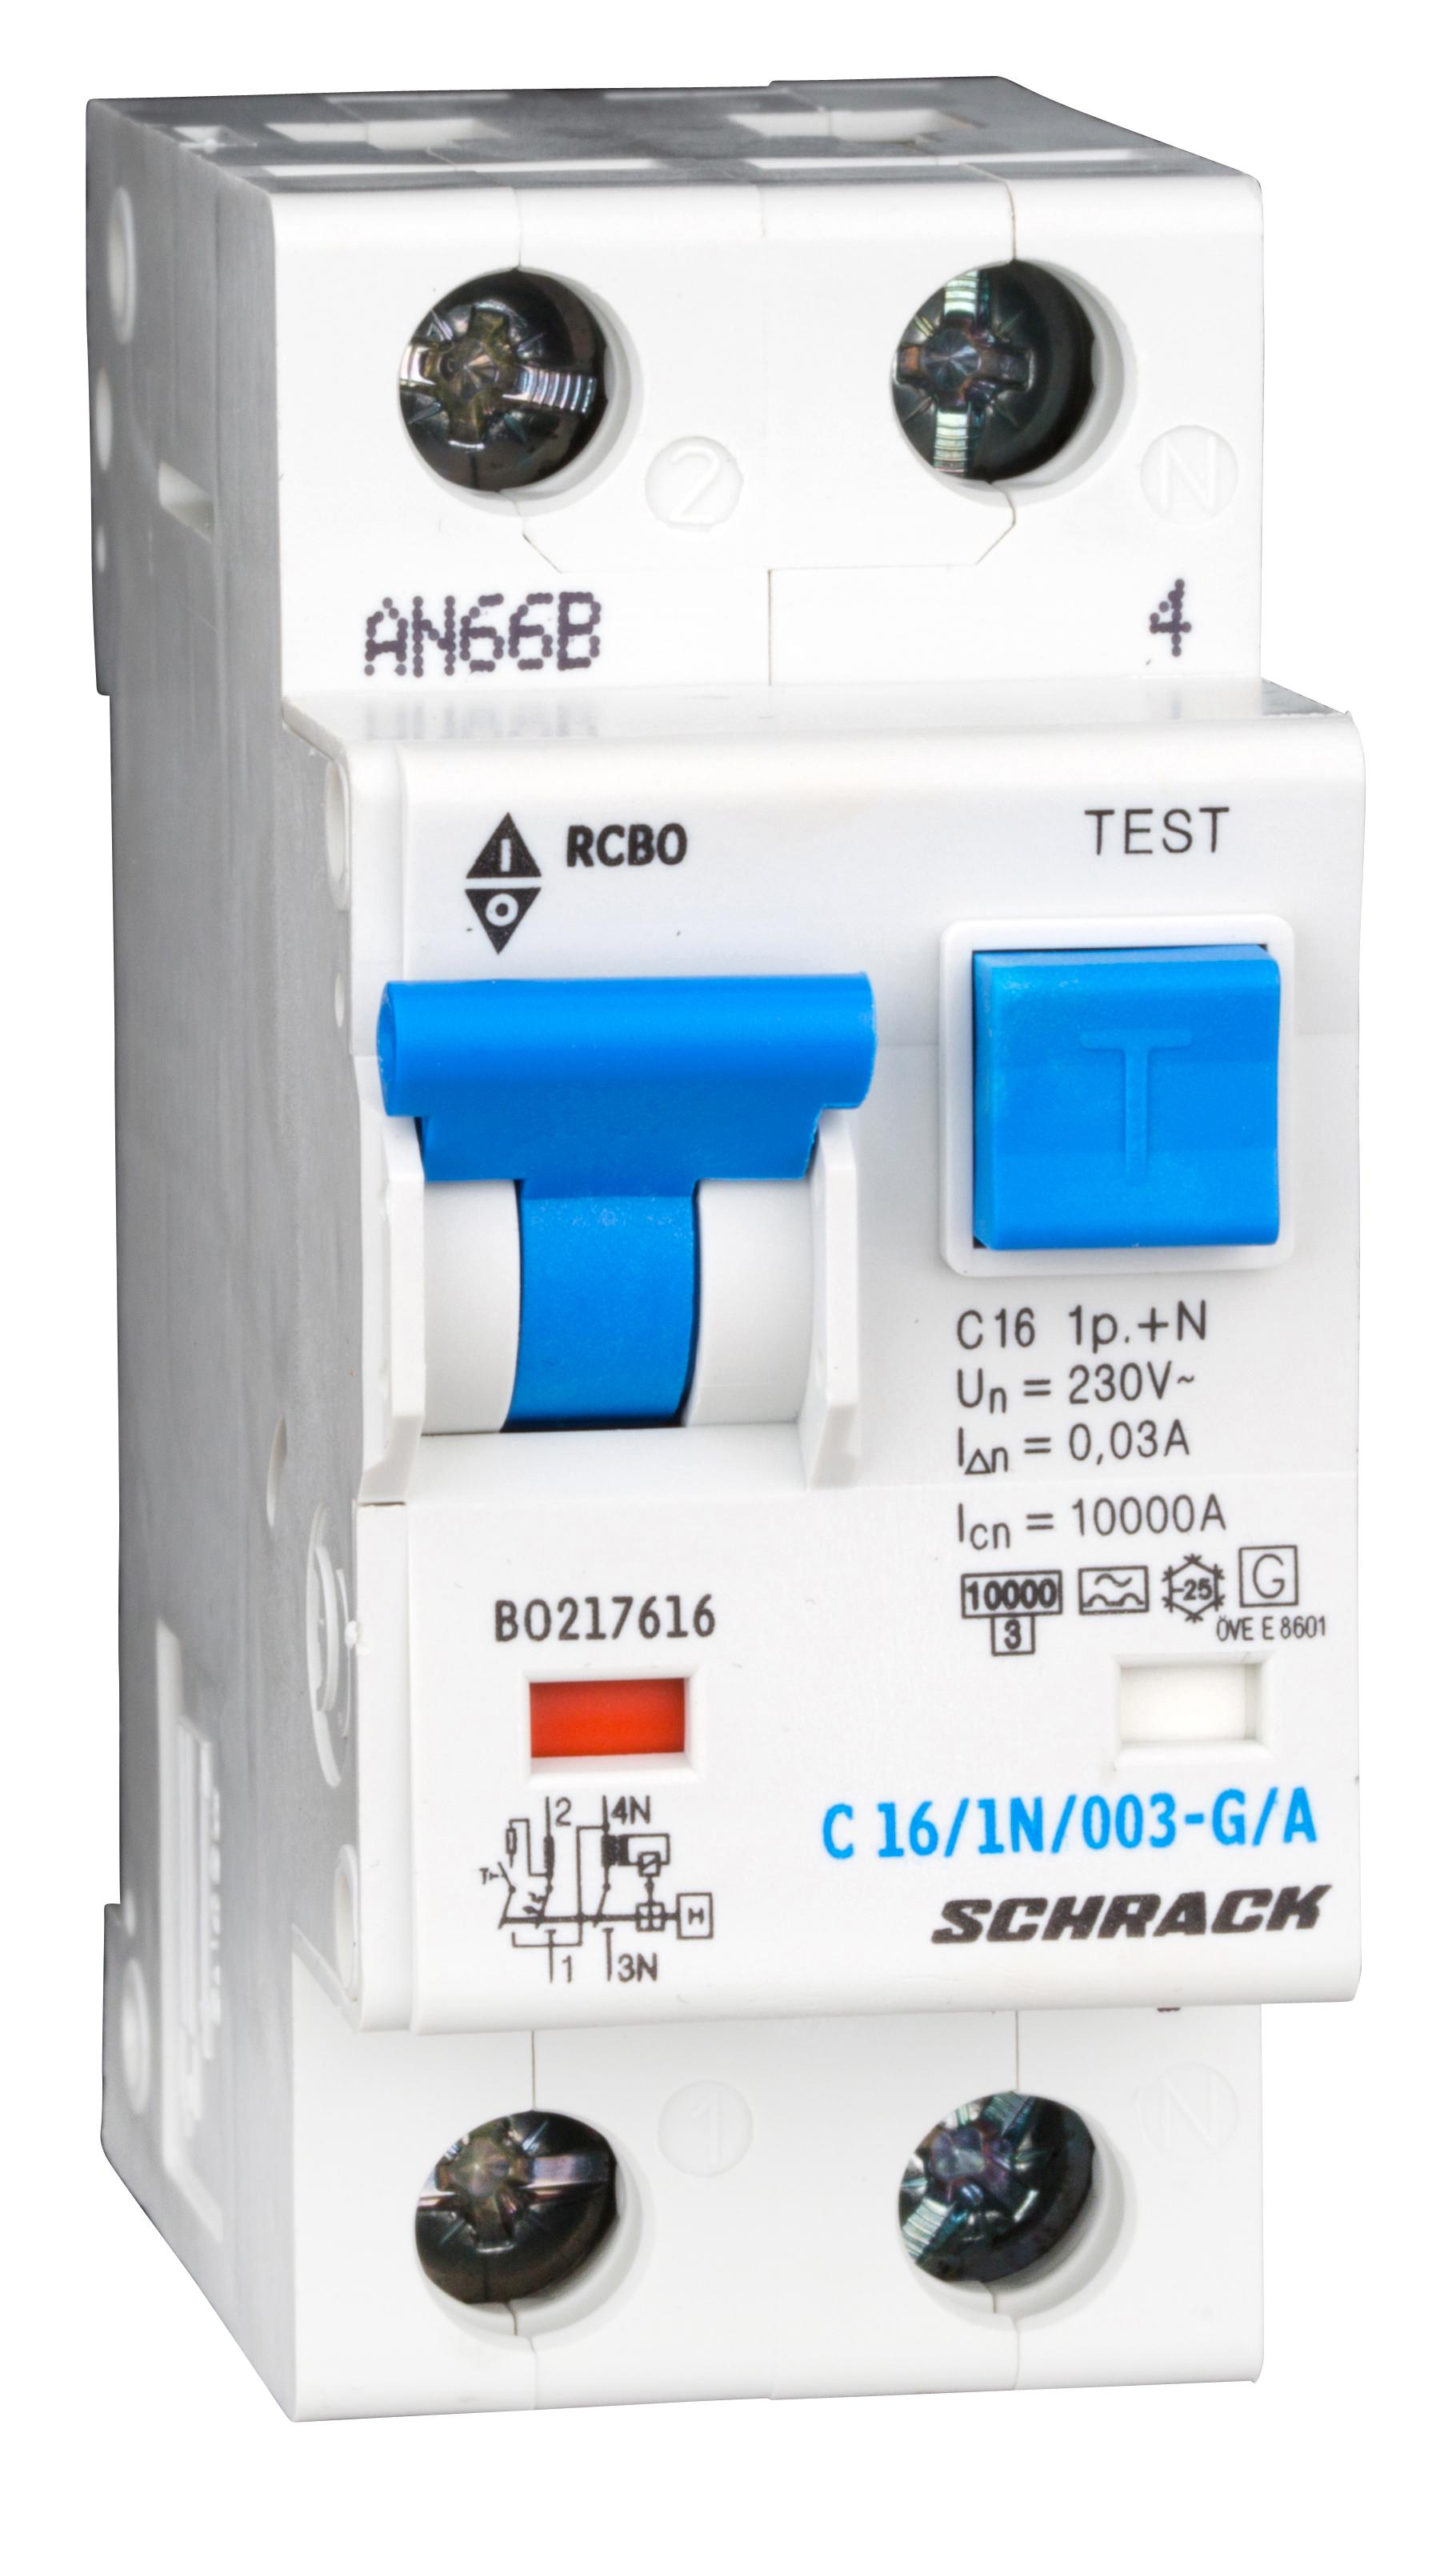 1 Stk LS-FI-Schalter,Kennl. C, 20A,30mA,1-polig+N, Bauart G,Typ A BO217620--